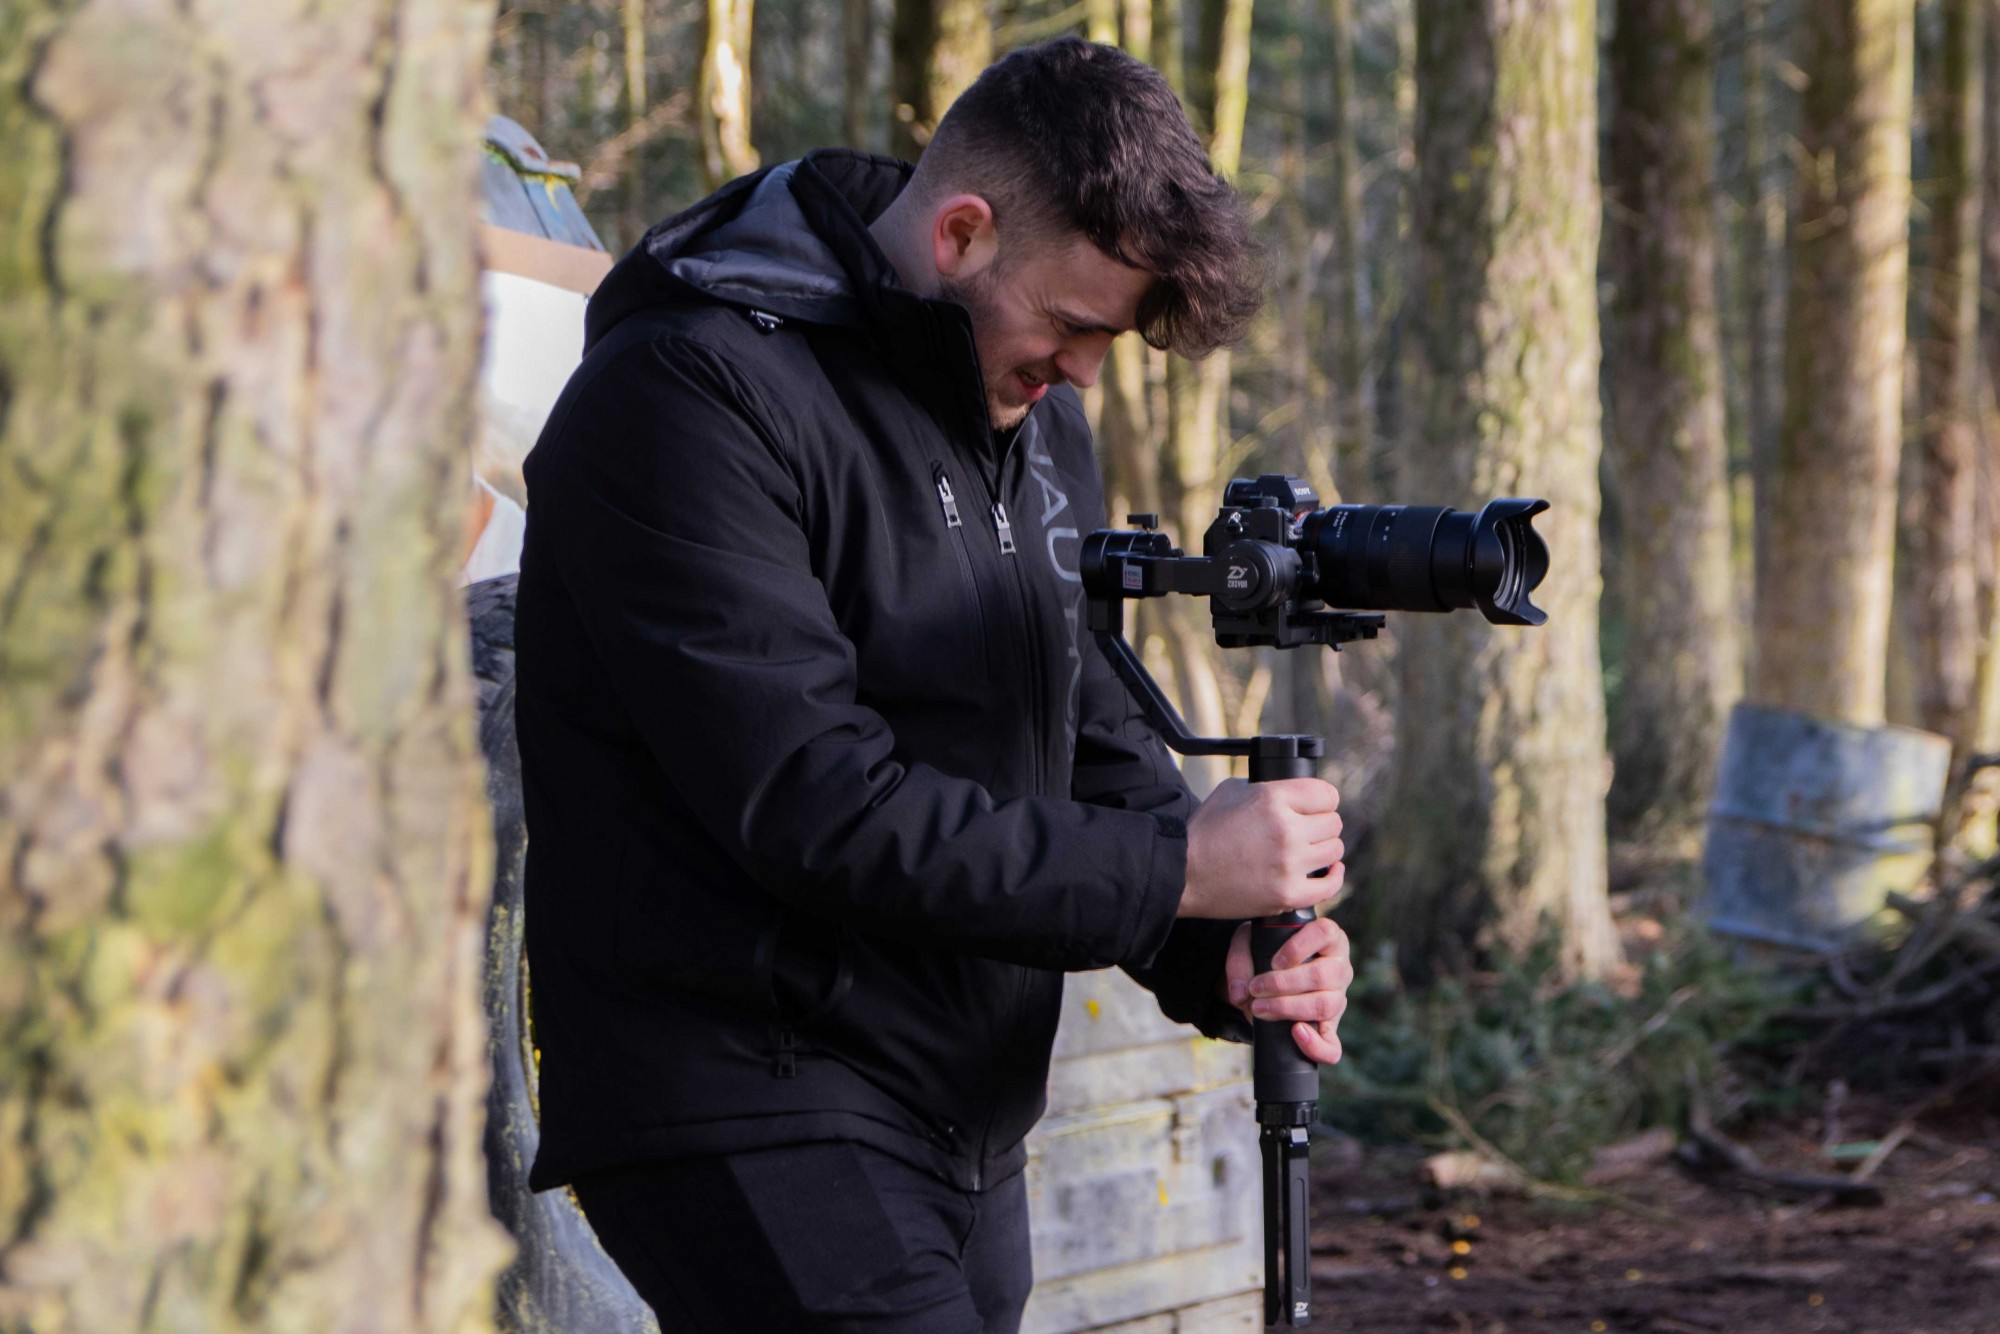 camera team during a take